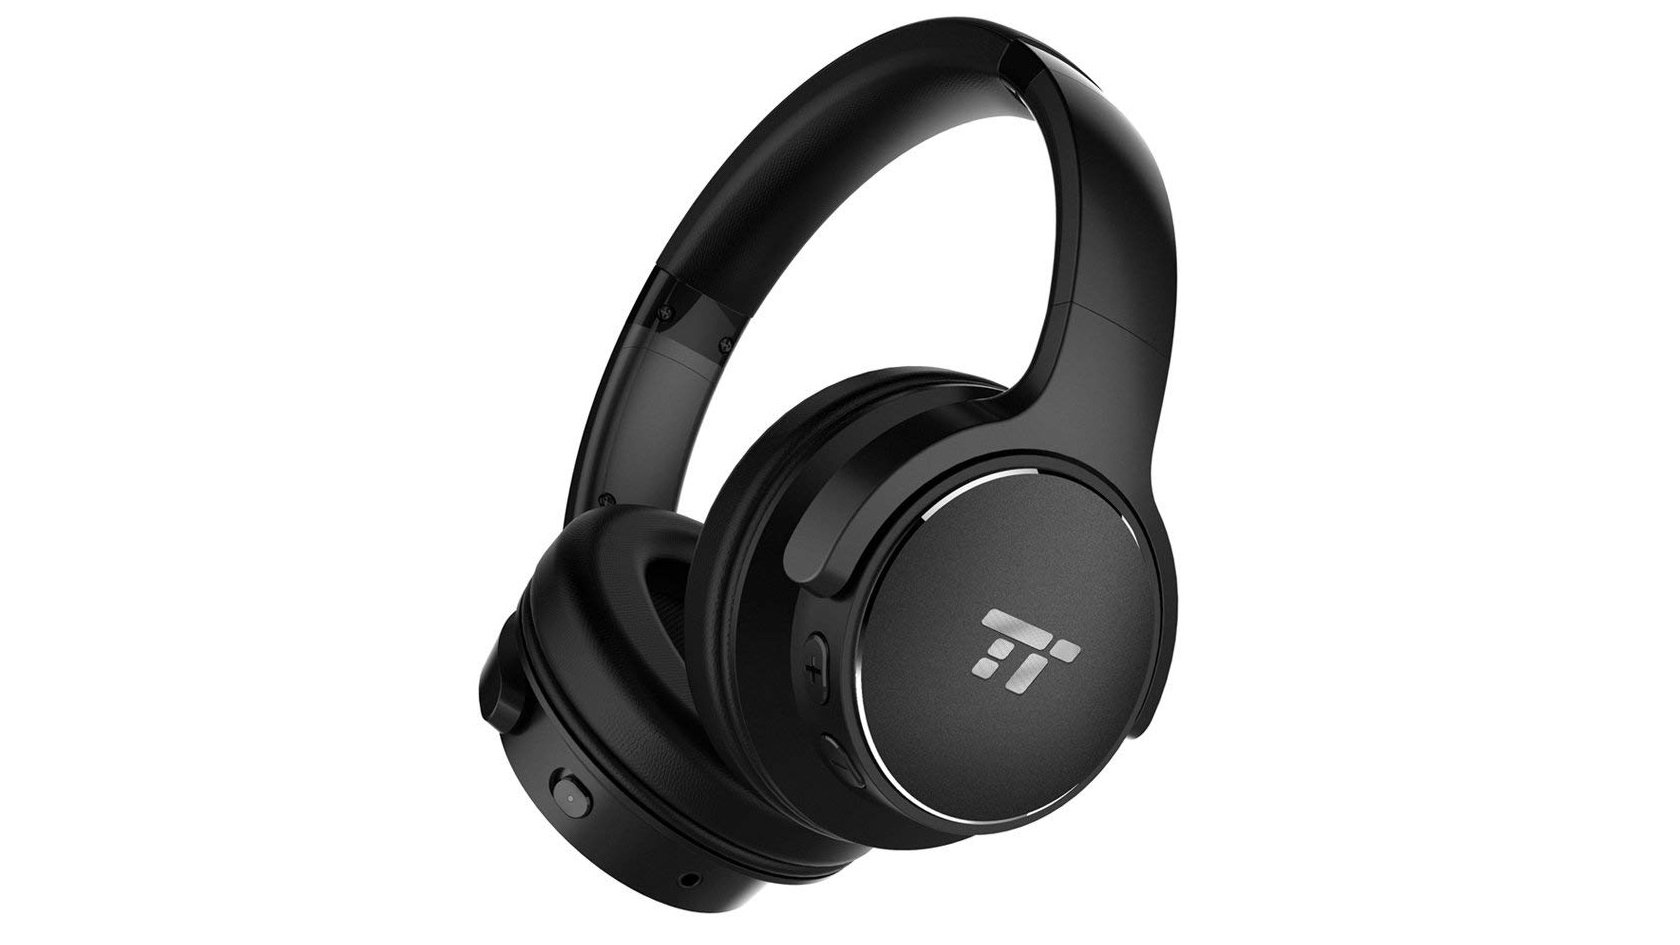 Best over ear headphones with mic under 50